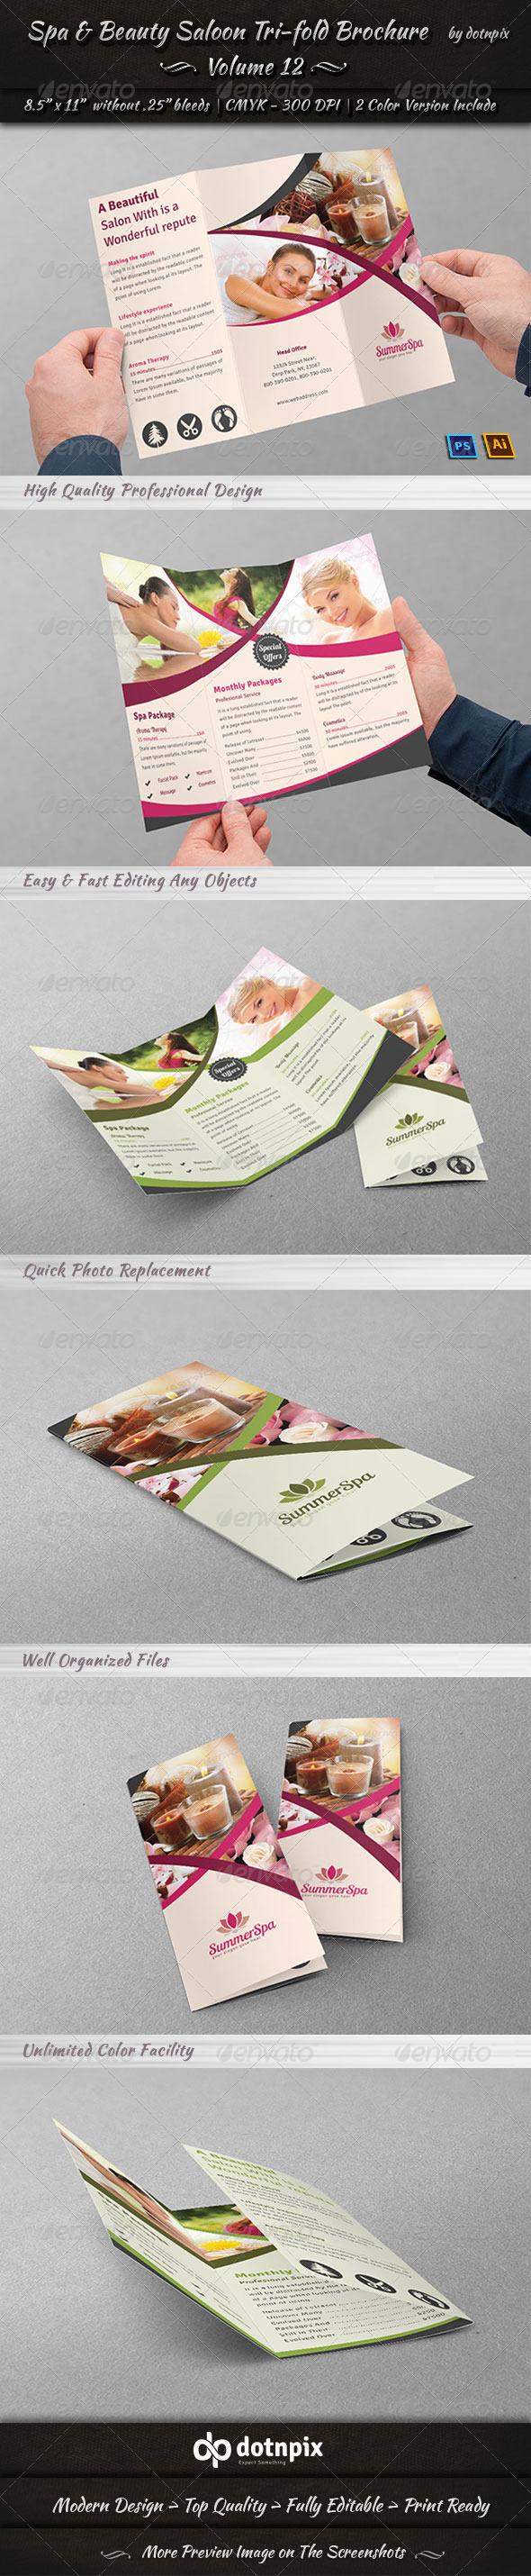 Spa & Beauty Saloon Tri-fold Brochure | Volume 12 - Print Templates